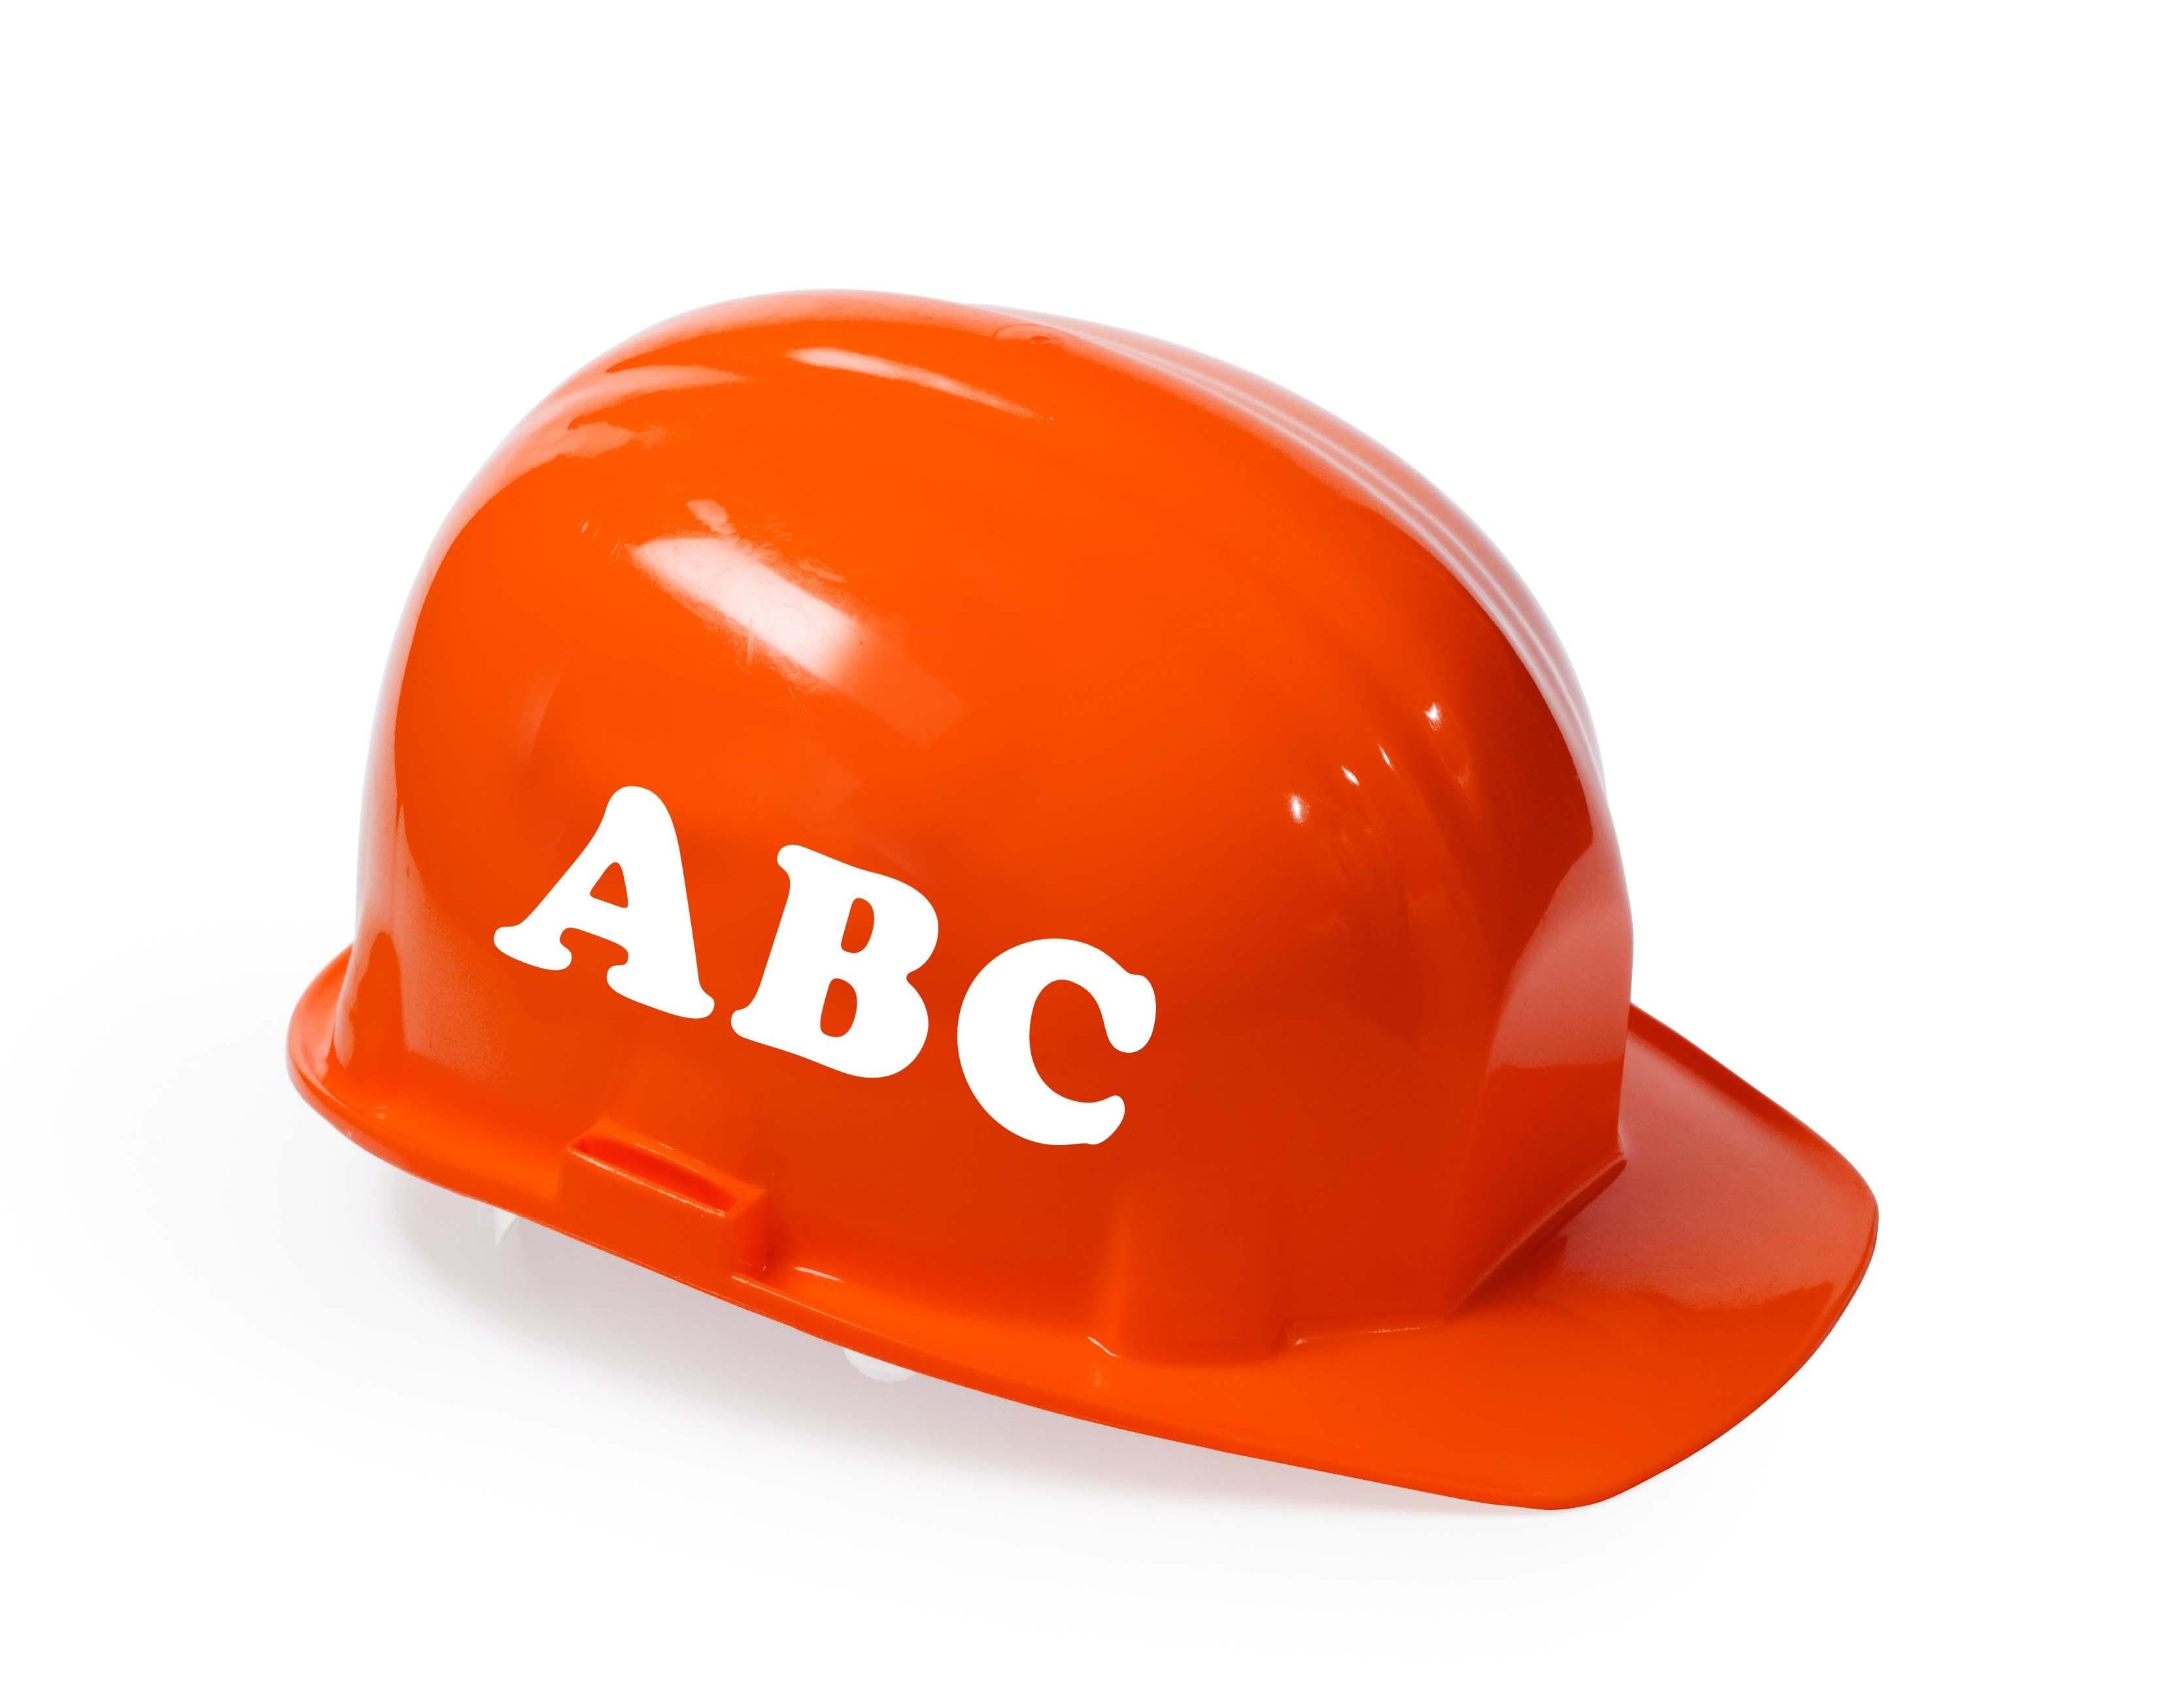 logo ABC - Algemene Bouwwerken Claes